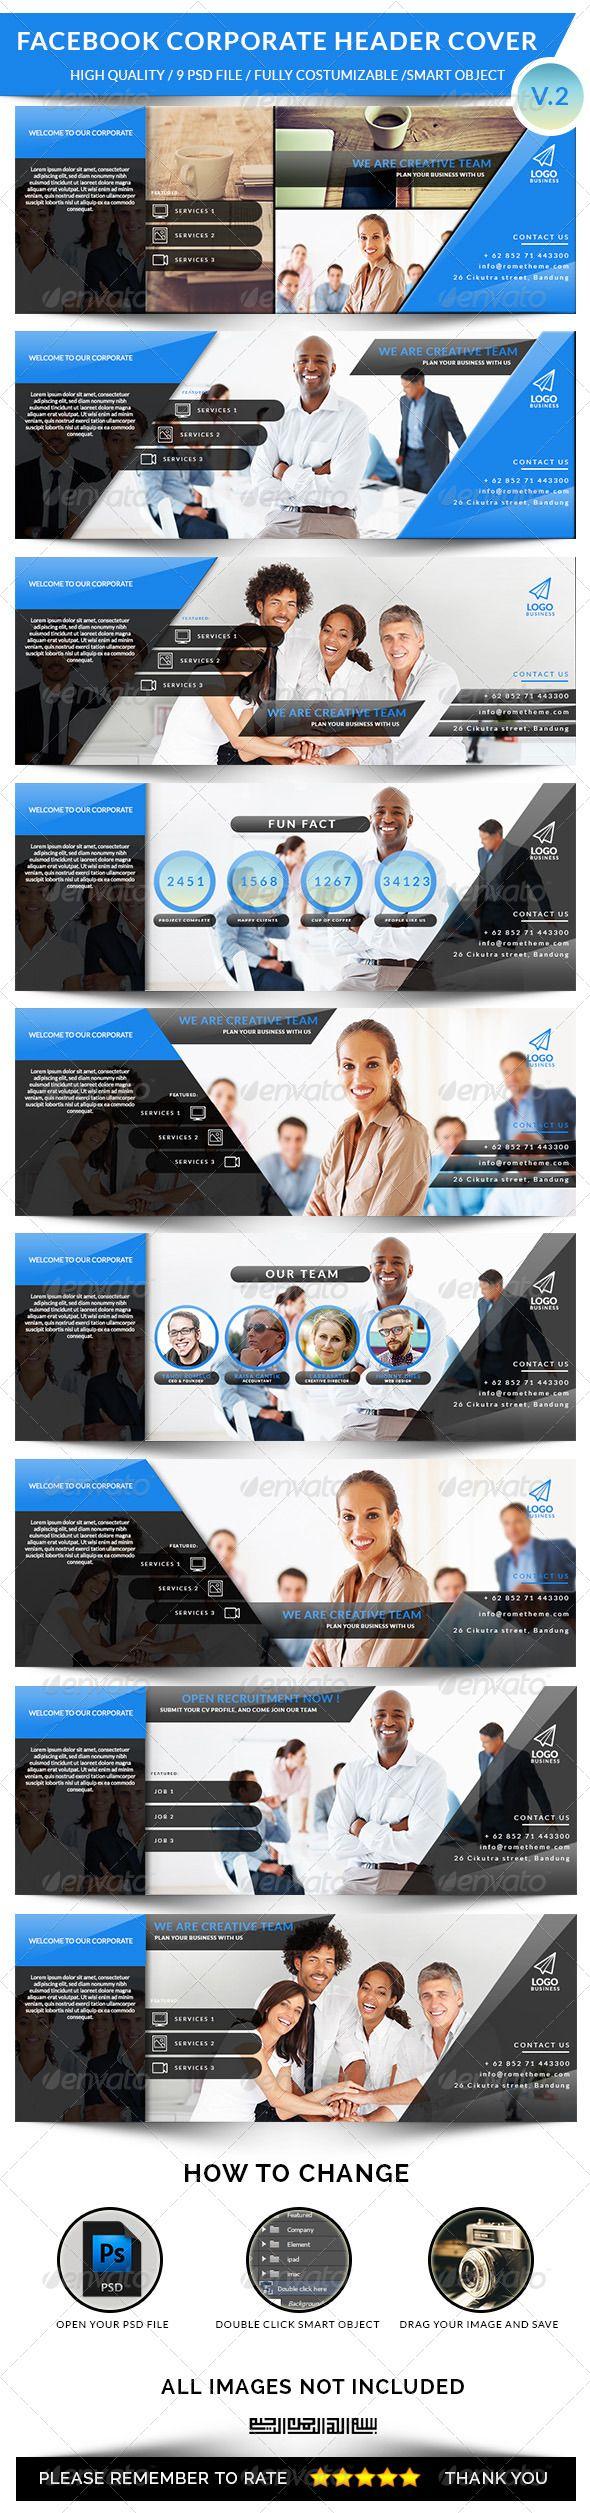 Facebook Corporate Header Cover V.2